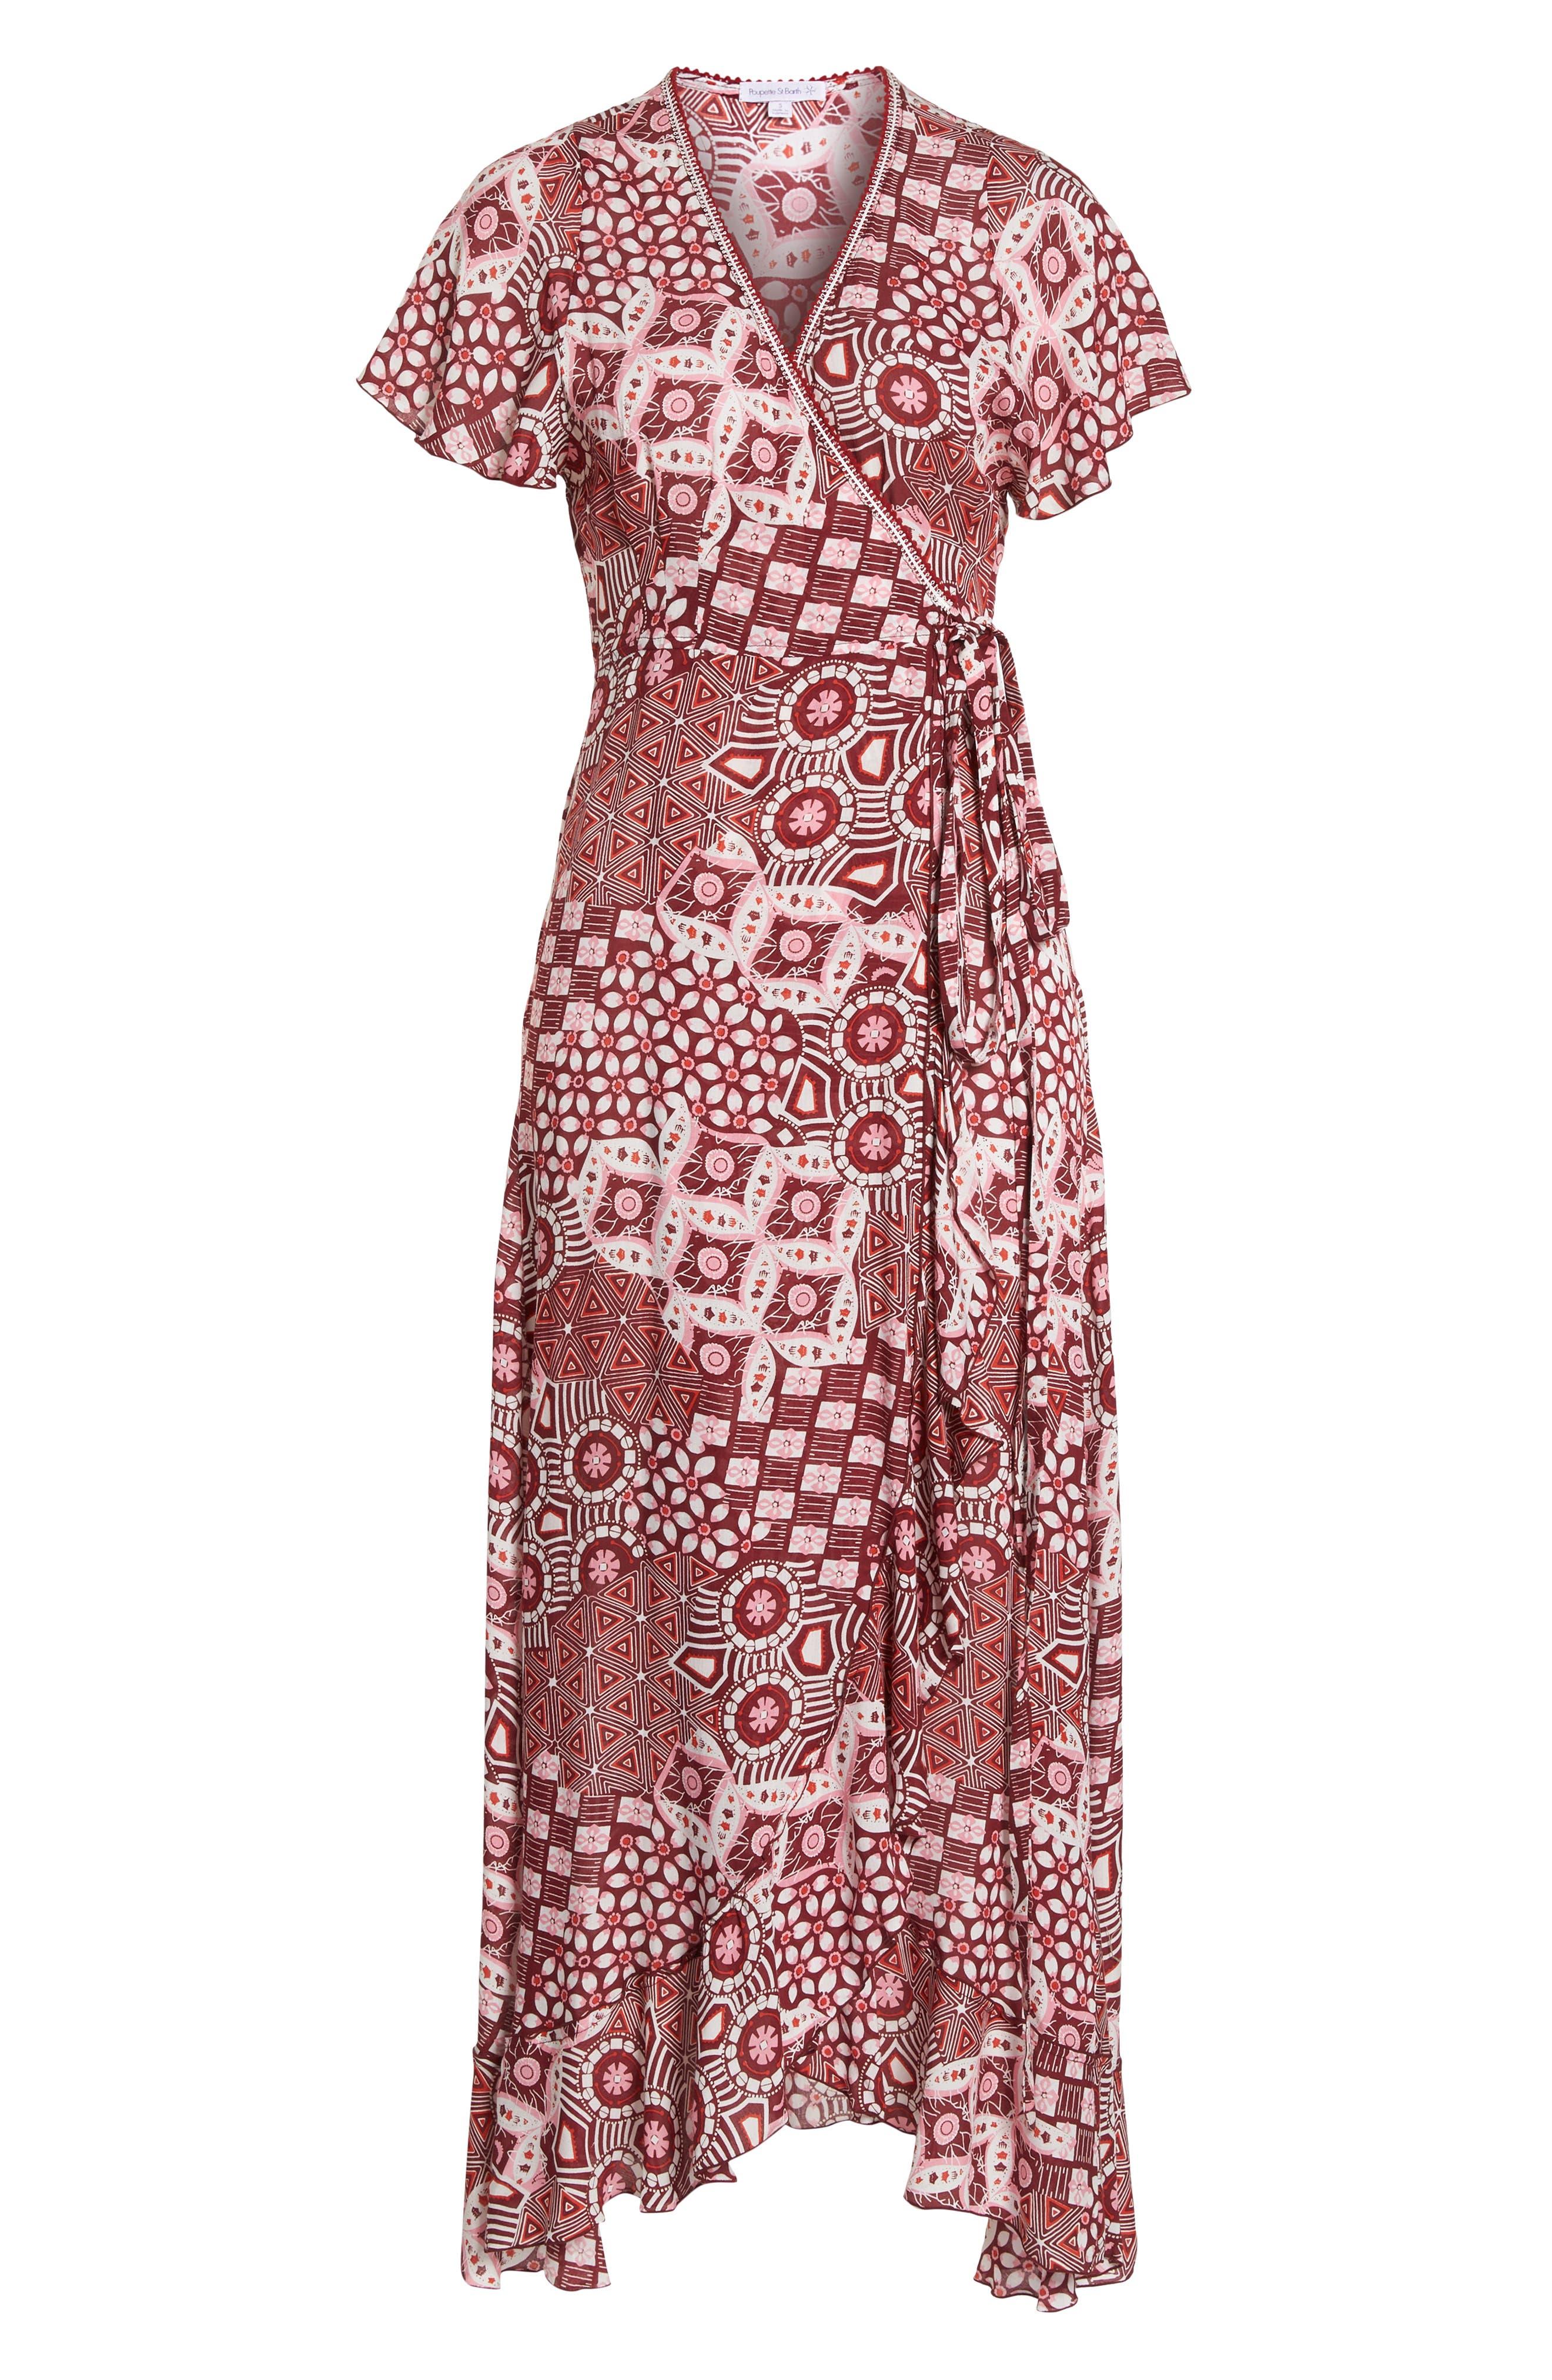 Poupette St. Barth Joe Cover-Up Maxi Dress,                             Alternate thumbnail 6, color,                             Pink Mali